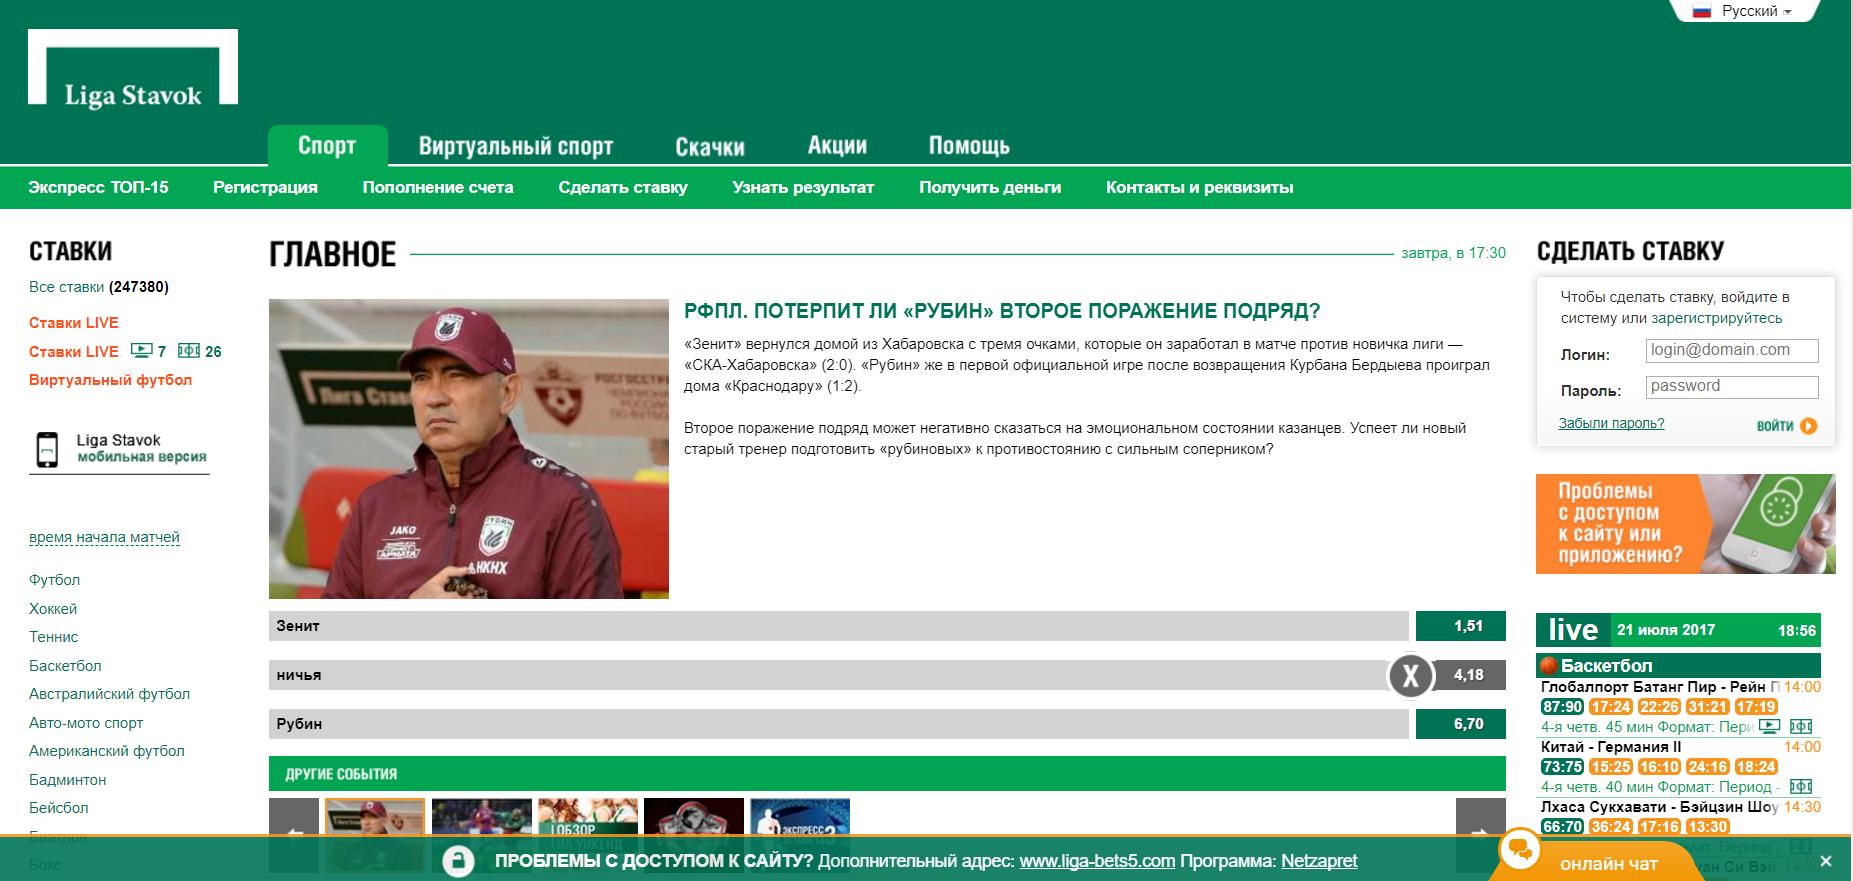 Биржа ставок на спорт на русском языке